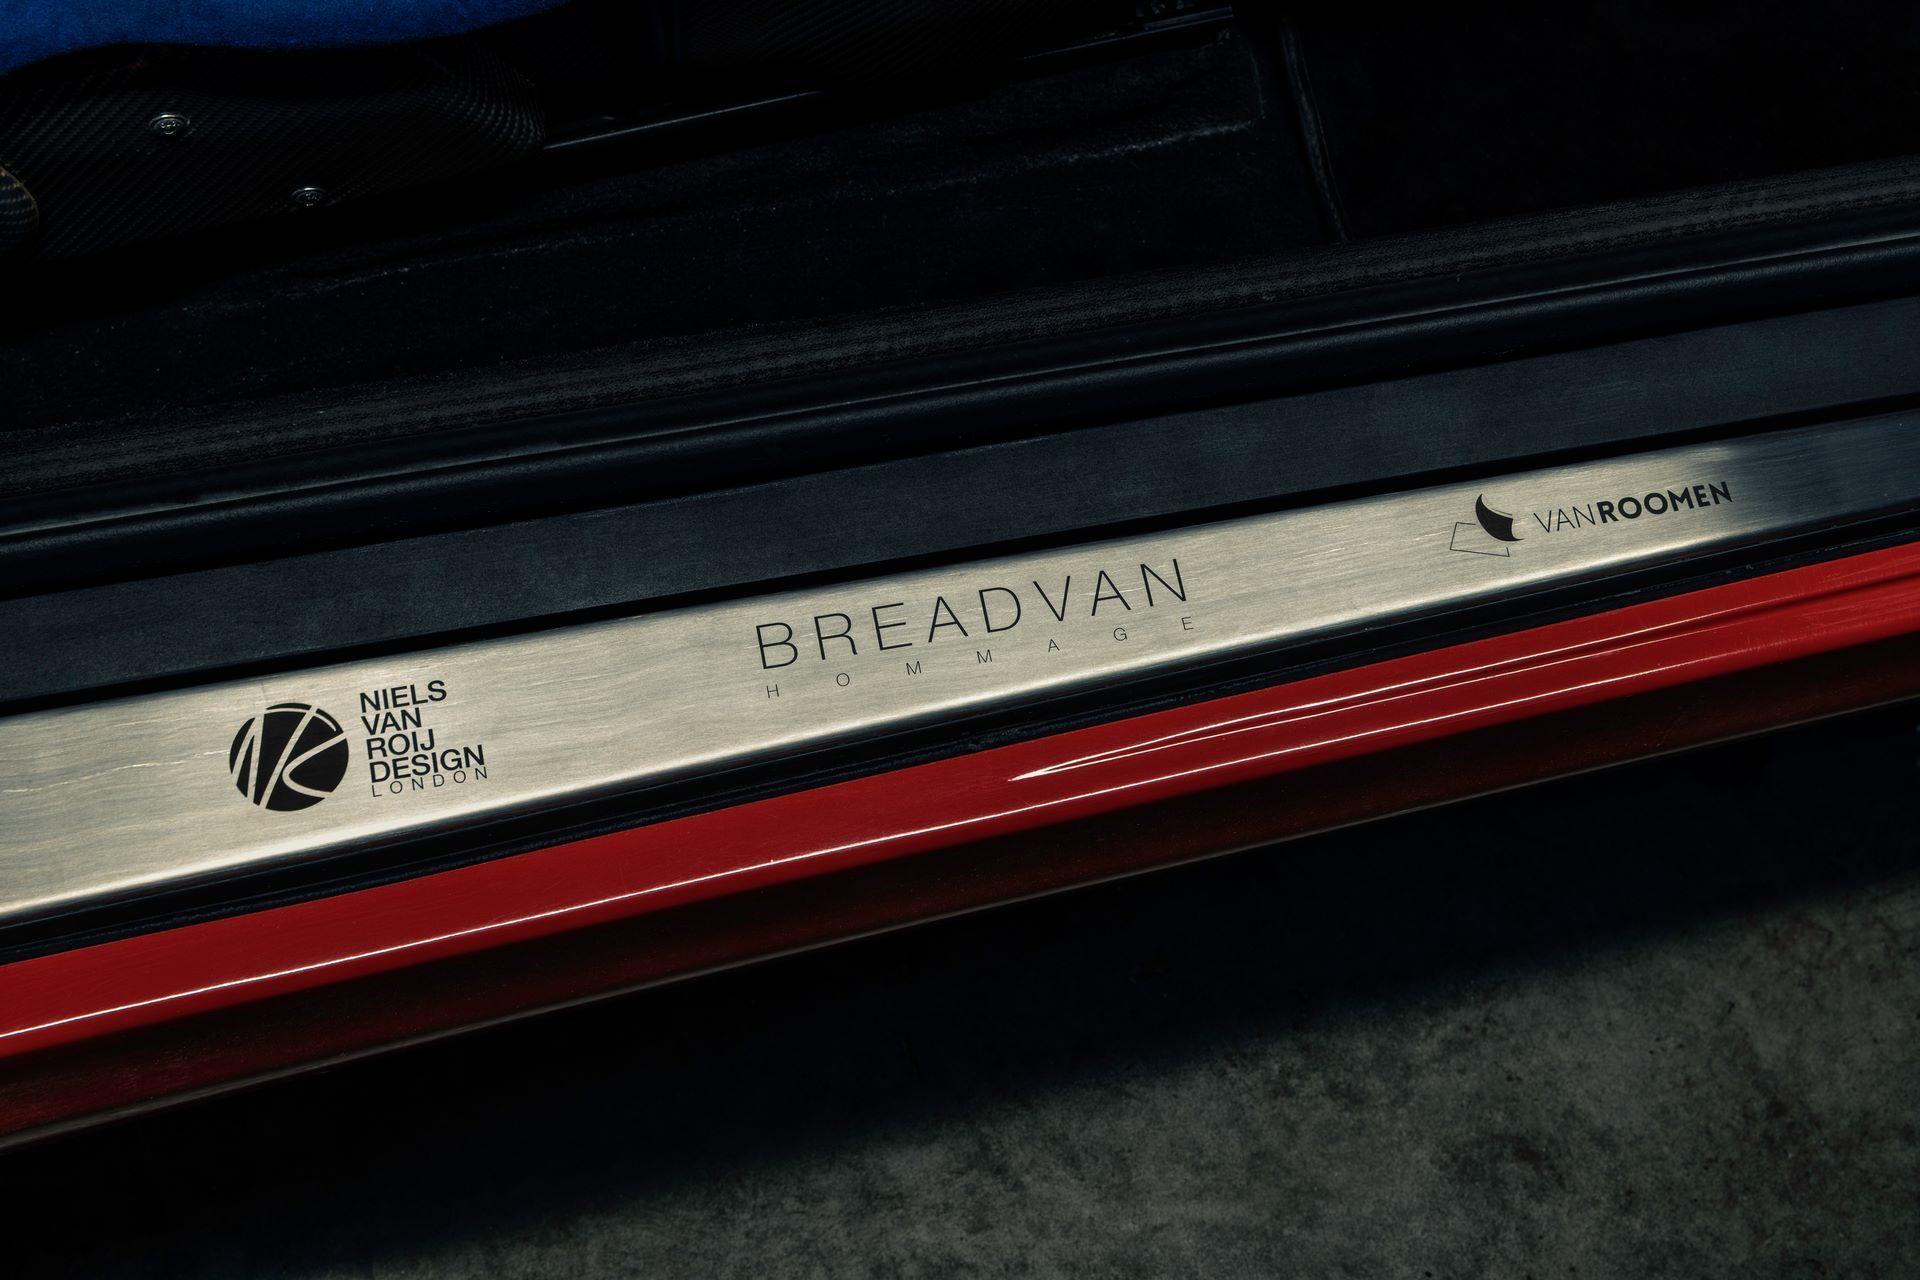 Ferrari-Breadvan-Hommage-136